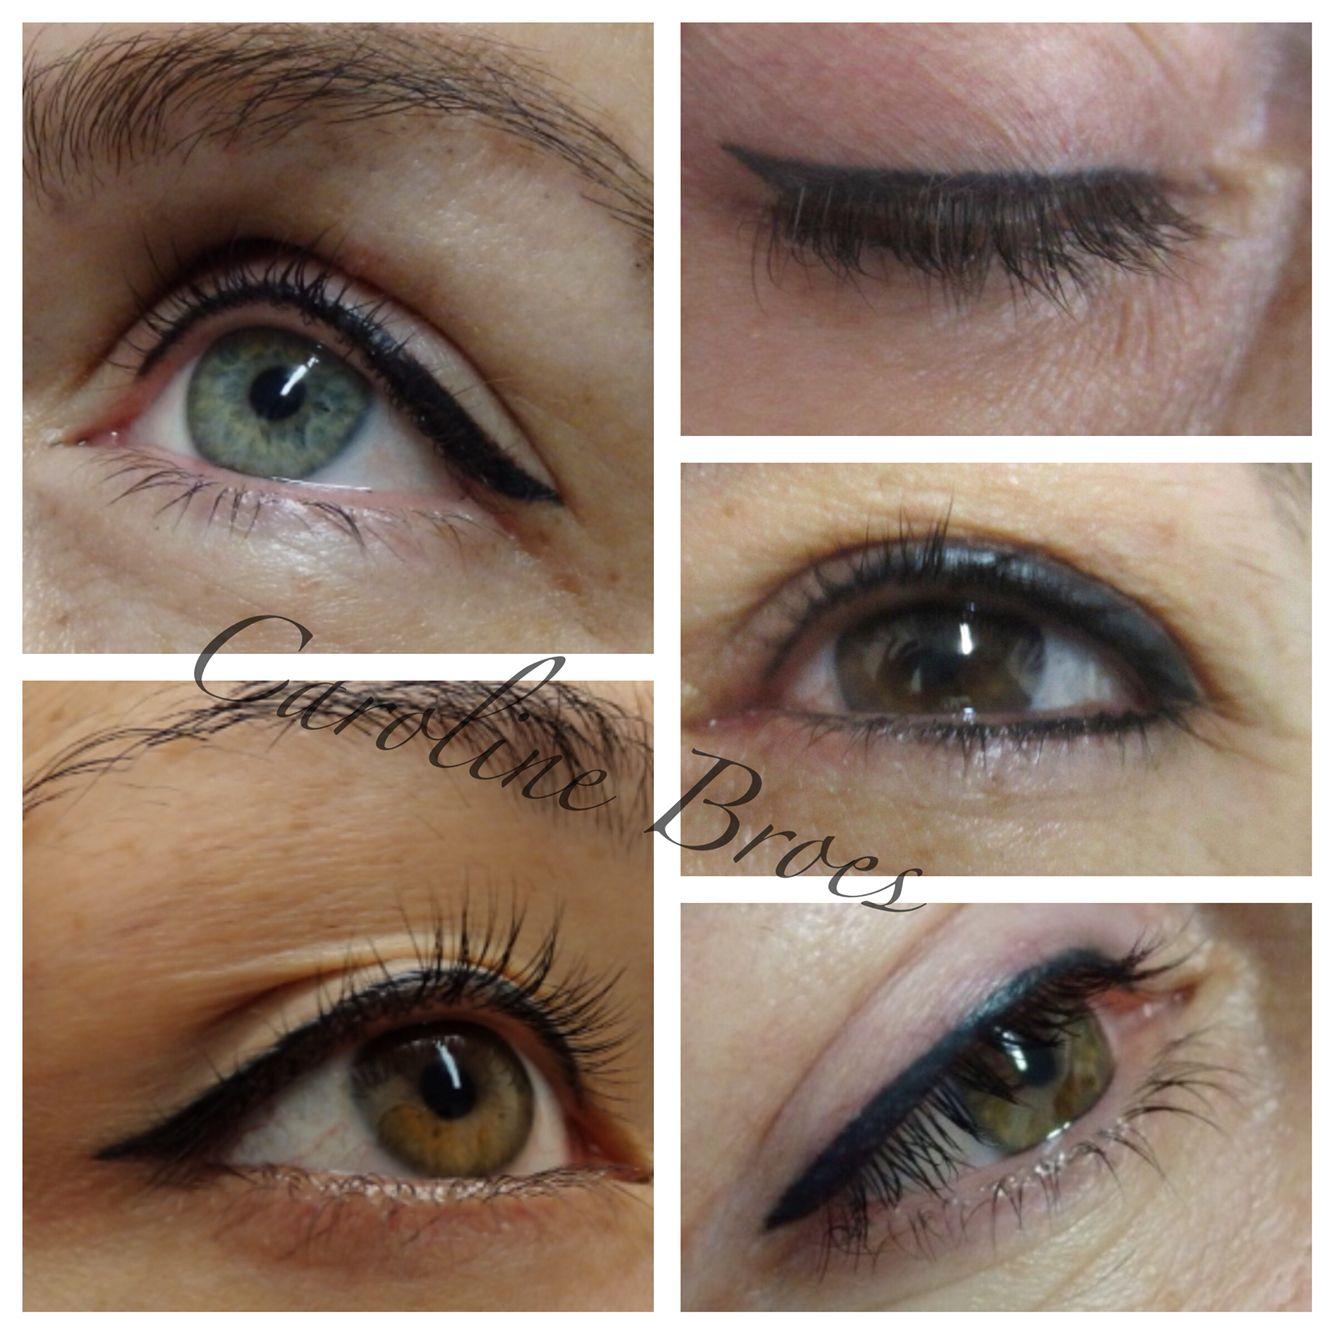 Healed eyeliners all styles Eyeliner, Permanent makeup